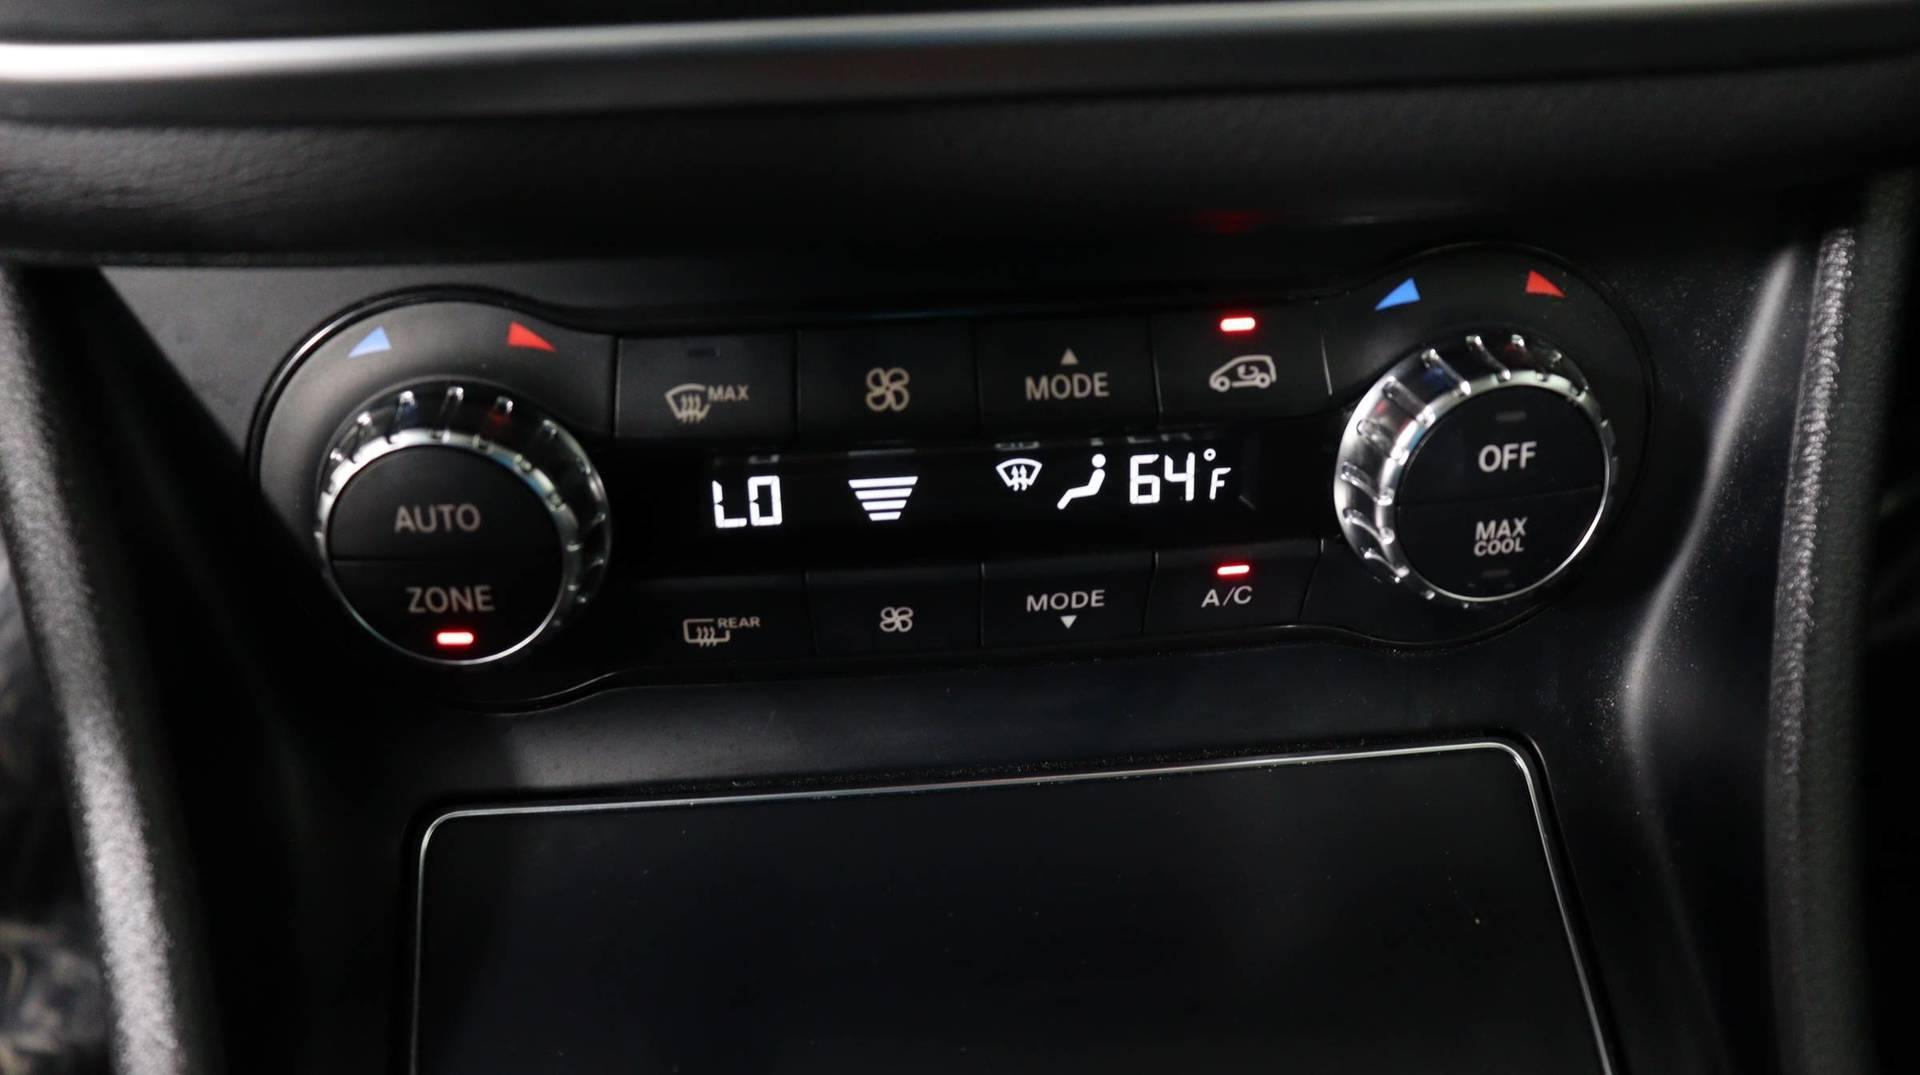 Carvix - Used vehicle - SUV MERCEDES-BENZ GLA 2018